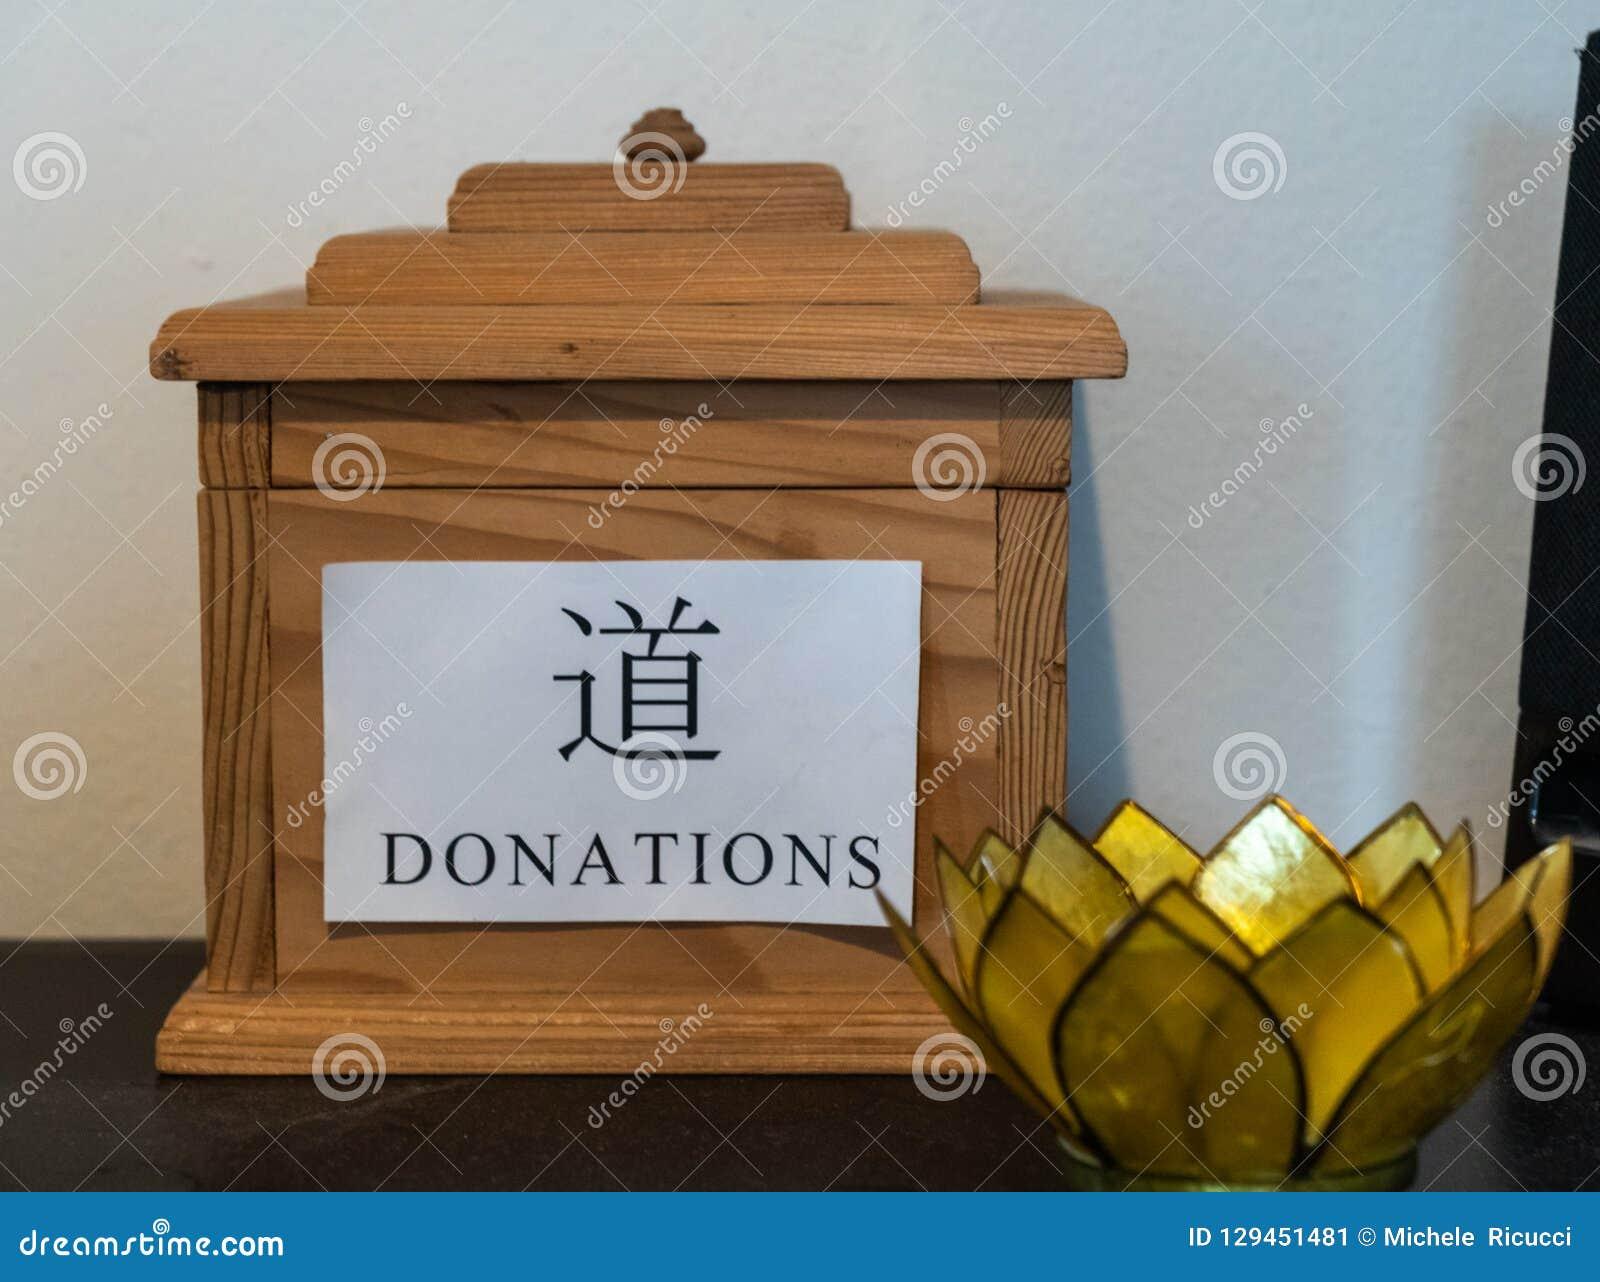 donation-tips-box-129451481.jpg